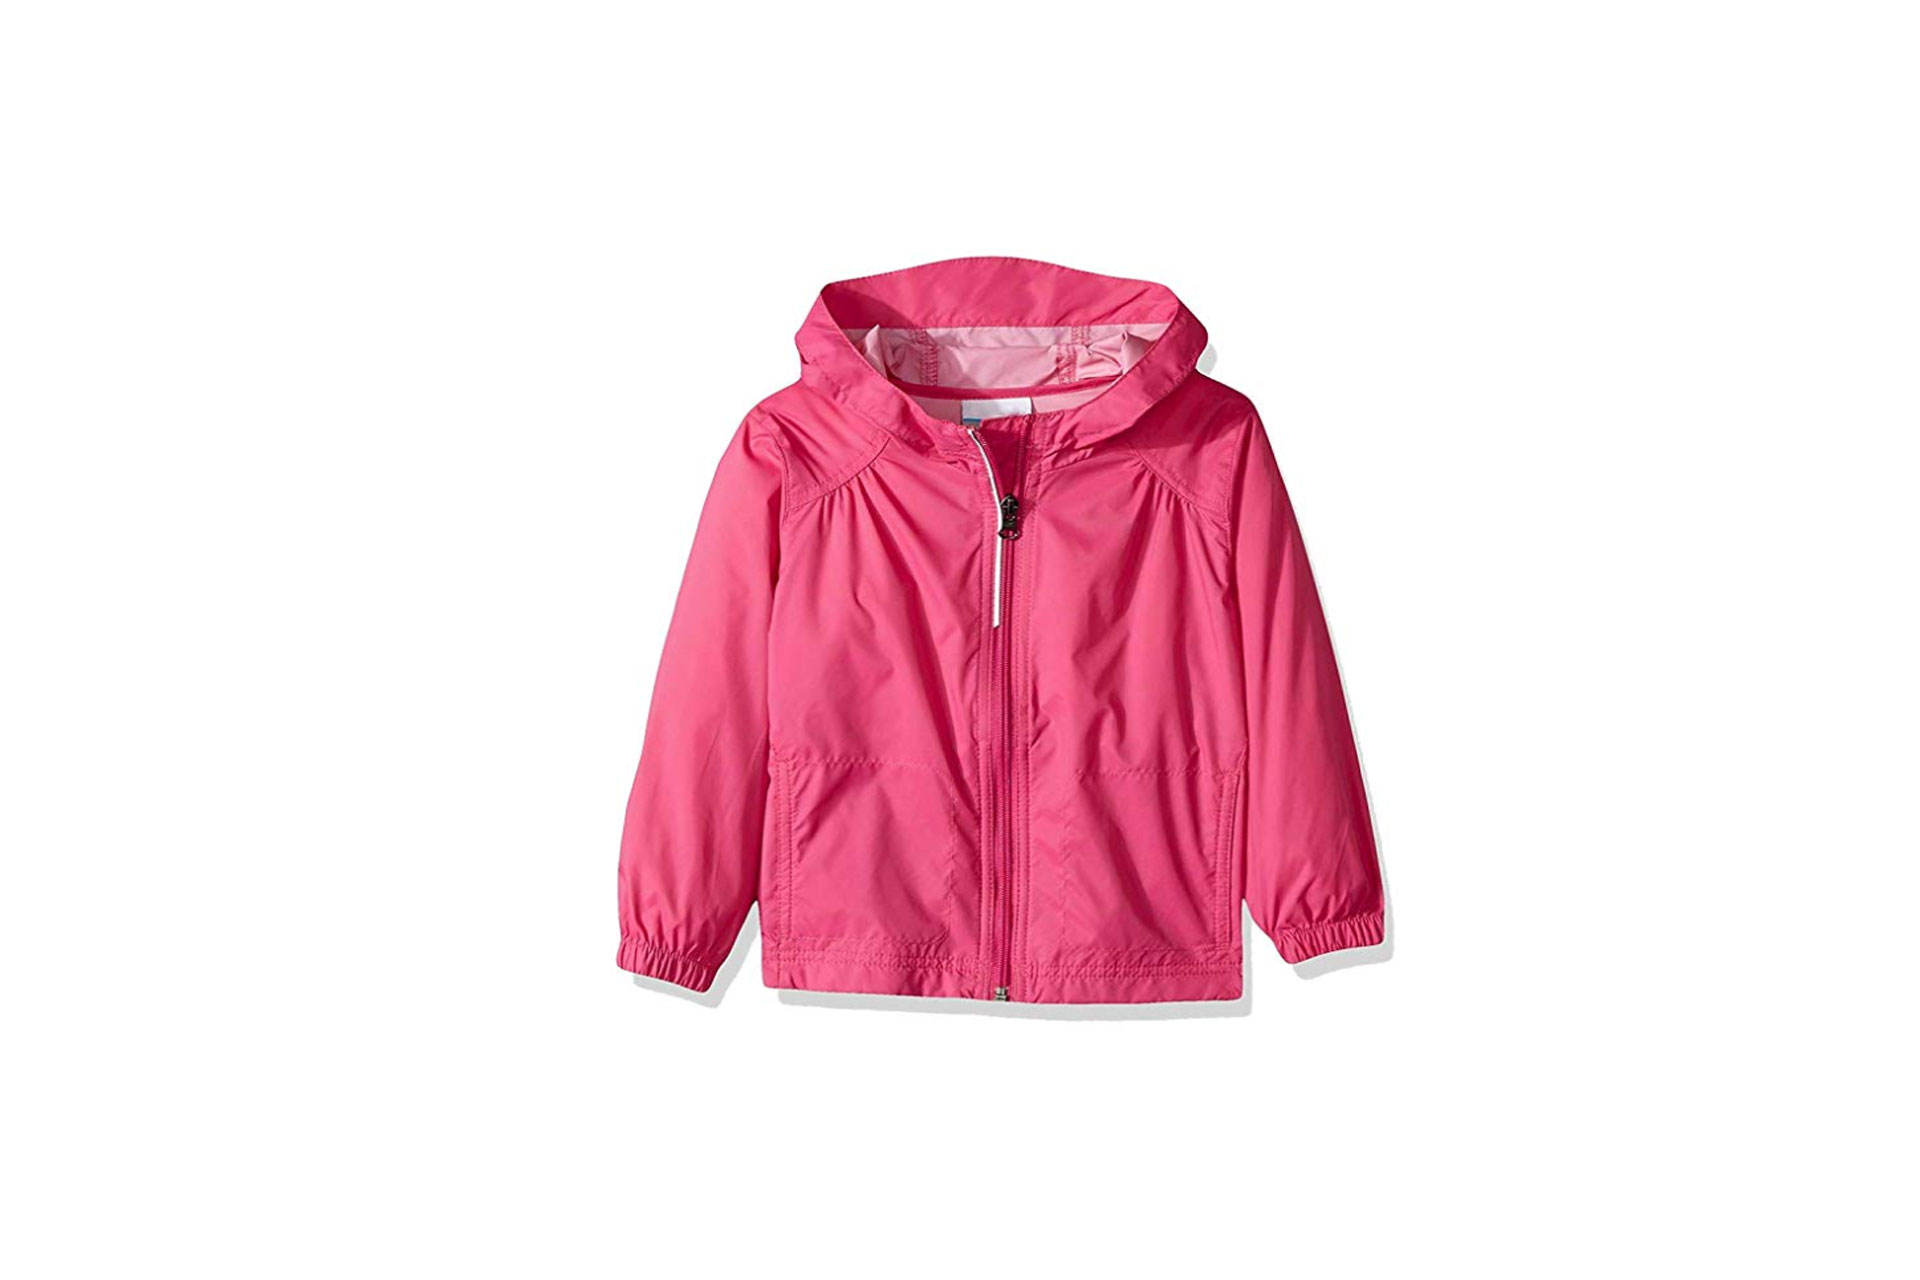 Kids' Pink Windbreaker; Courtesy of Amazon